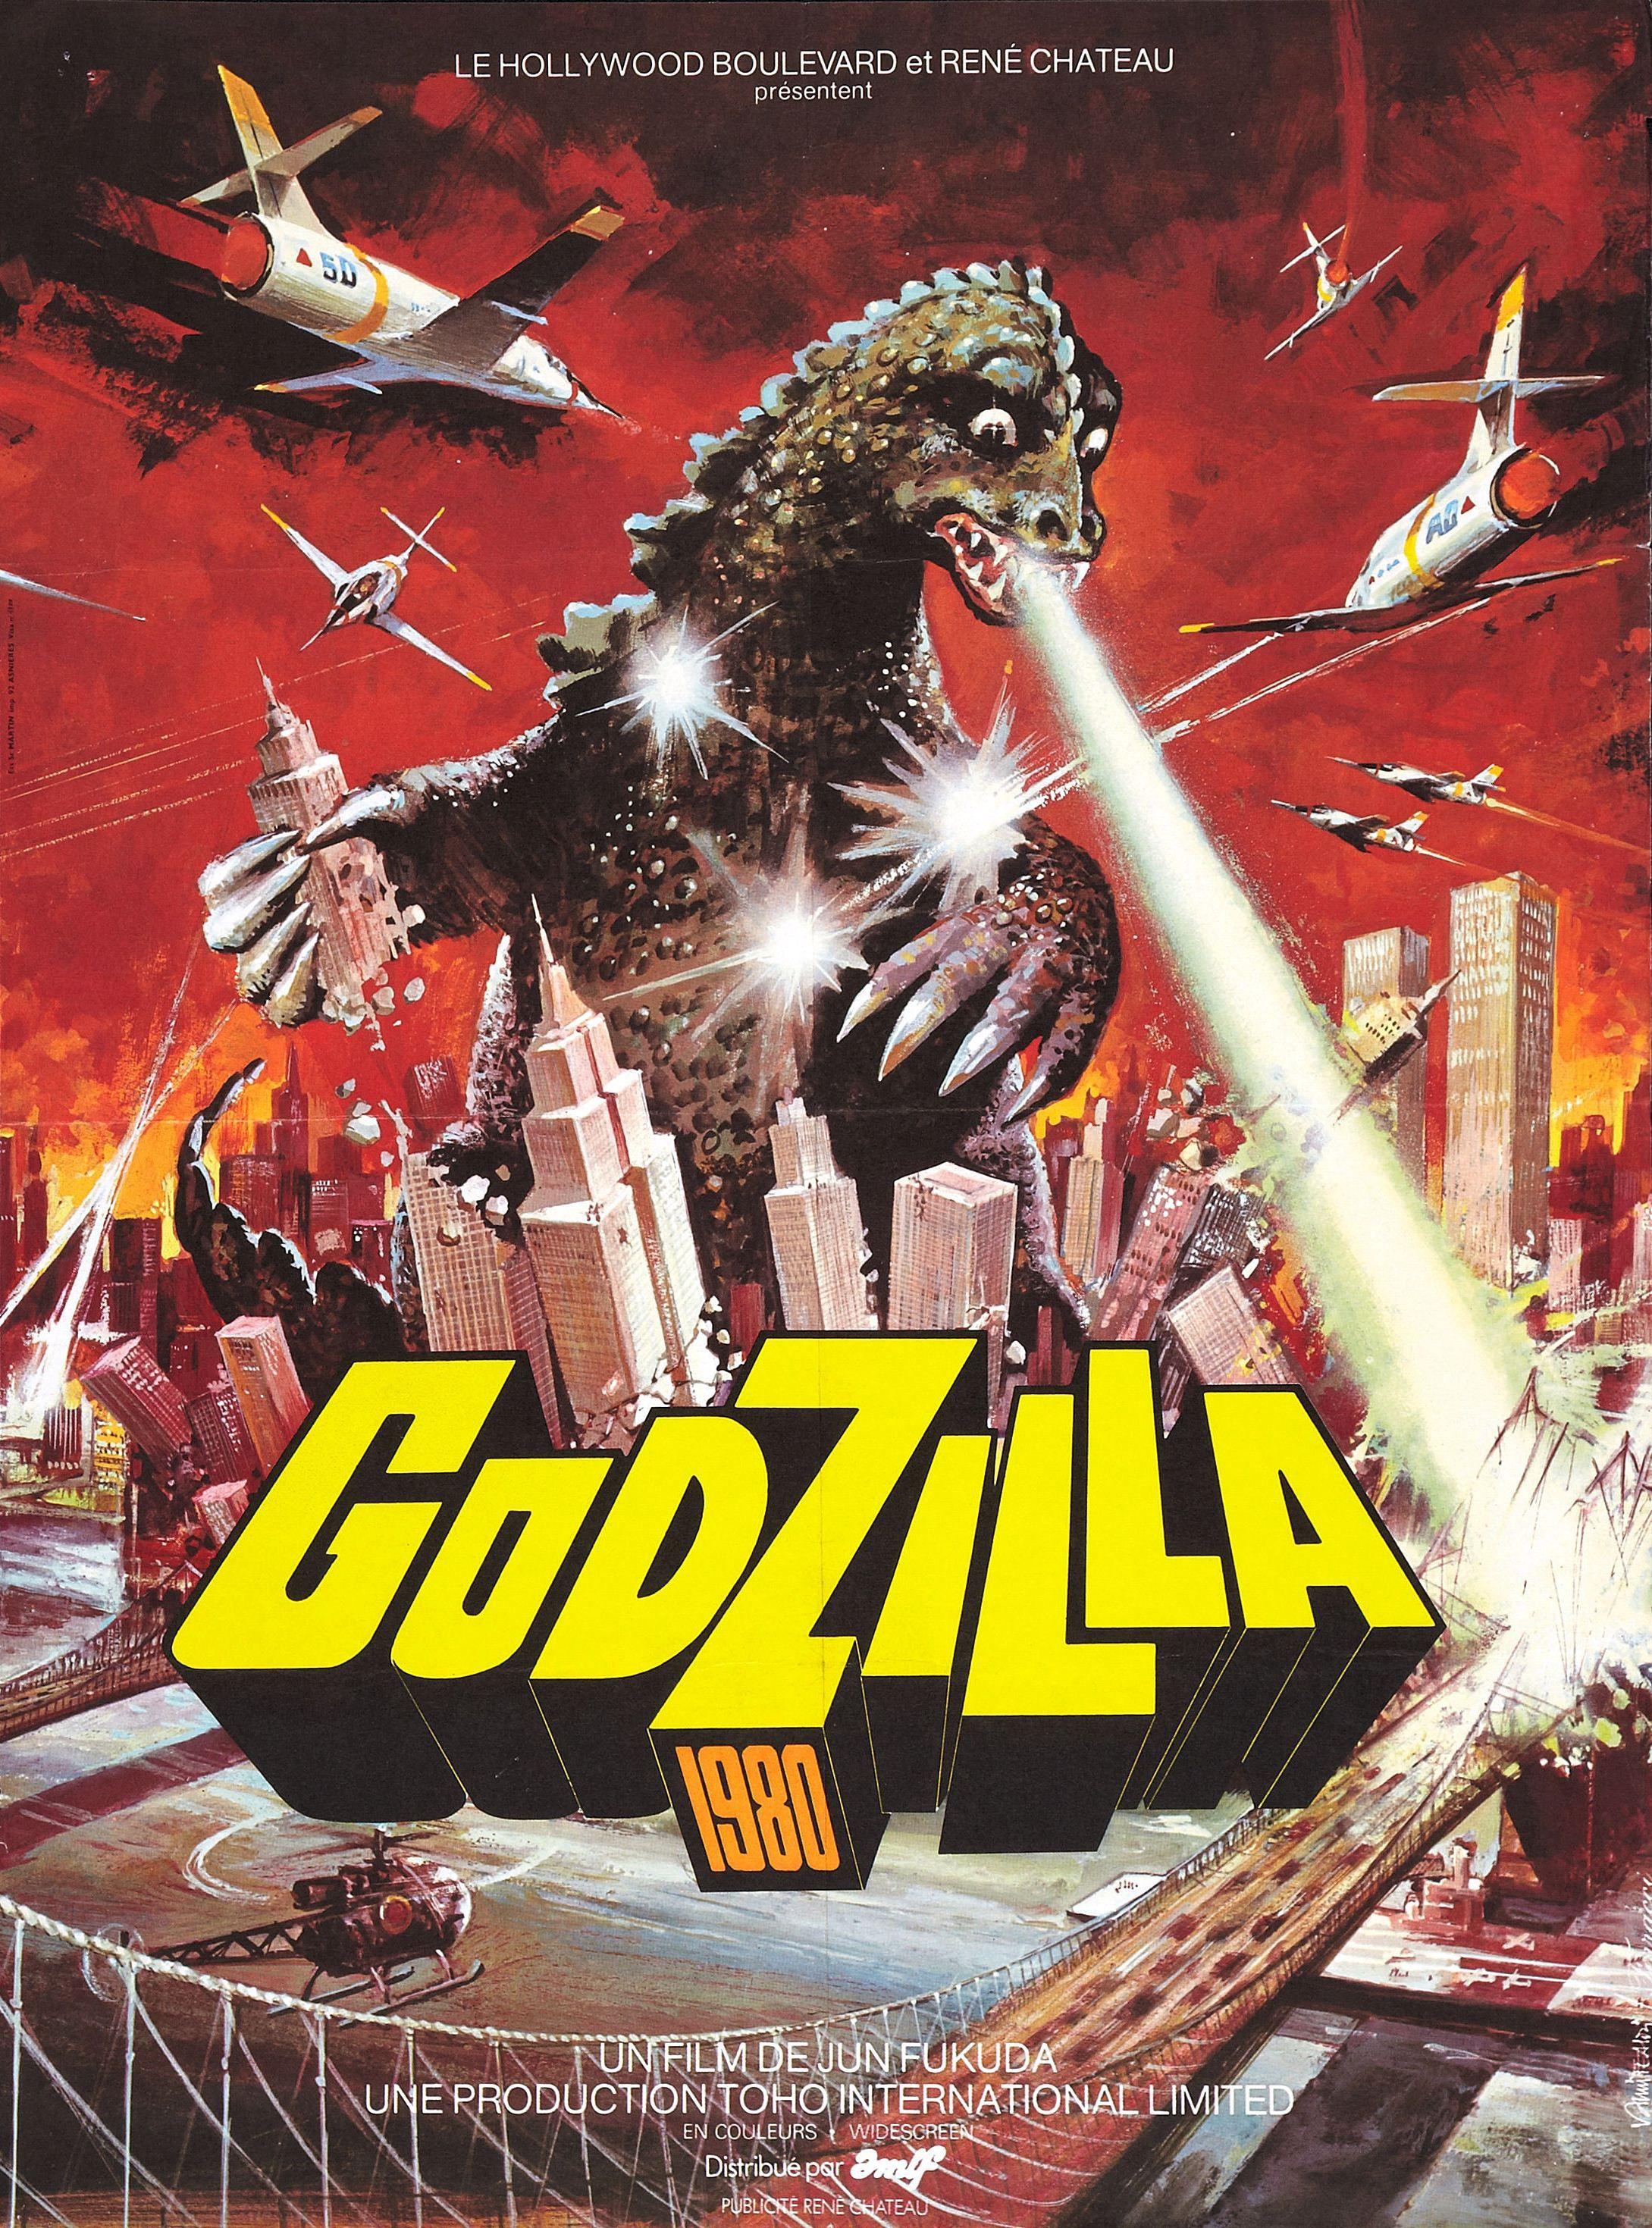 godzilla vs kong full movie download in english